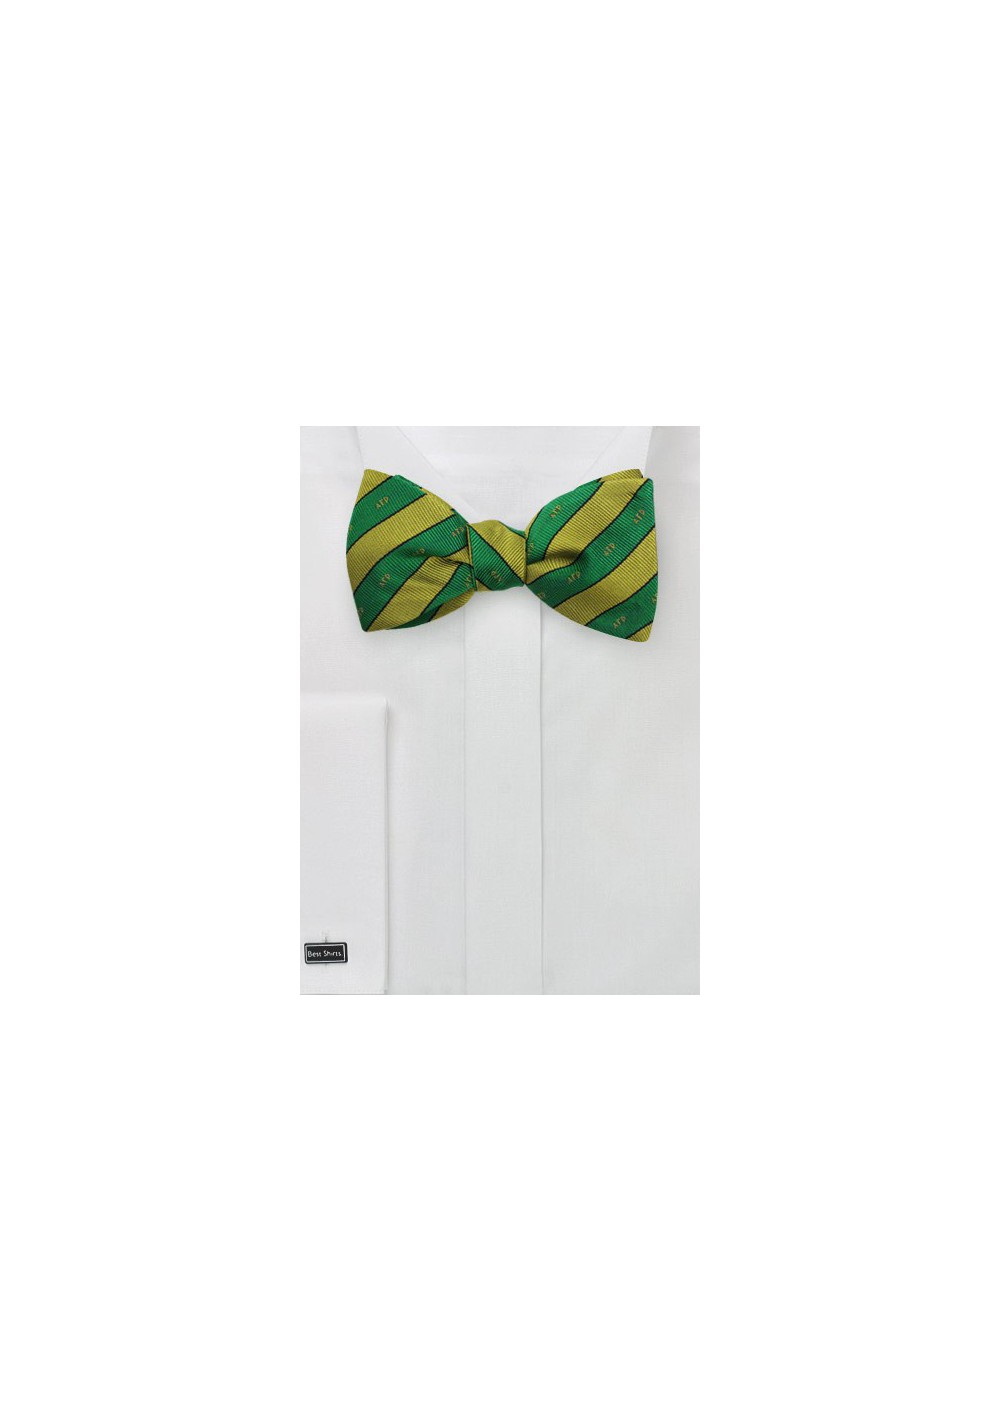 Self Tie Bow Tie for Alpha Gamma Rho